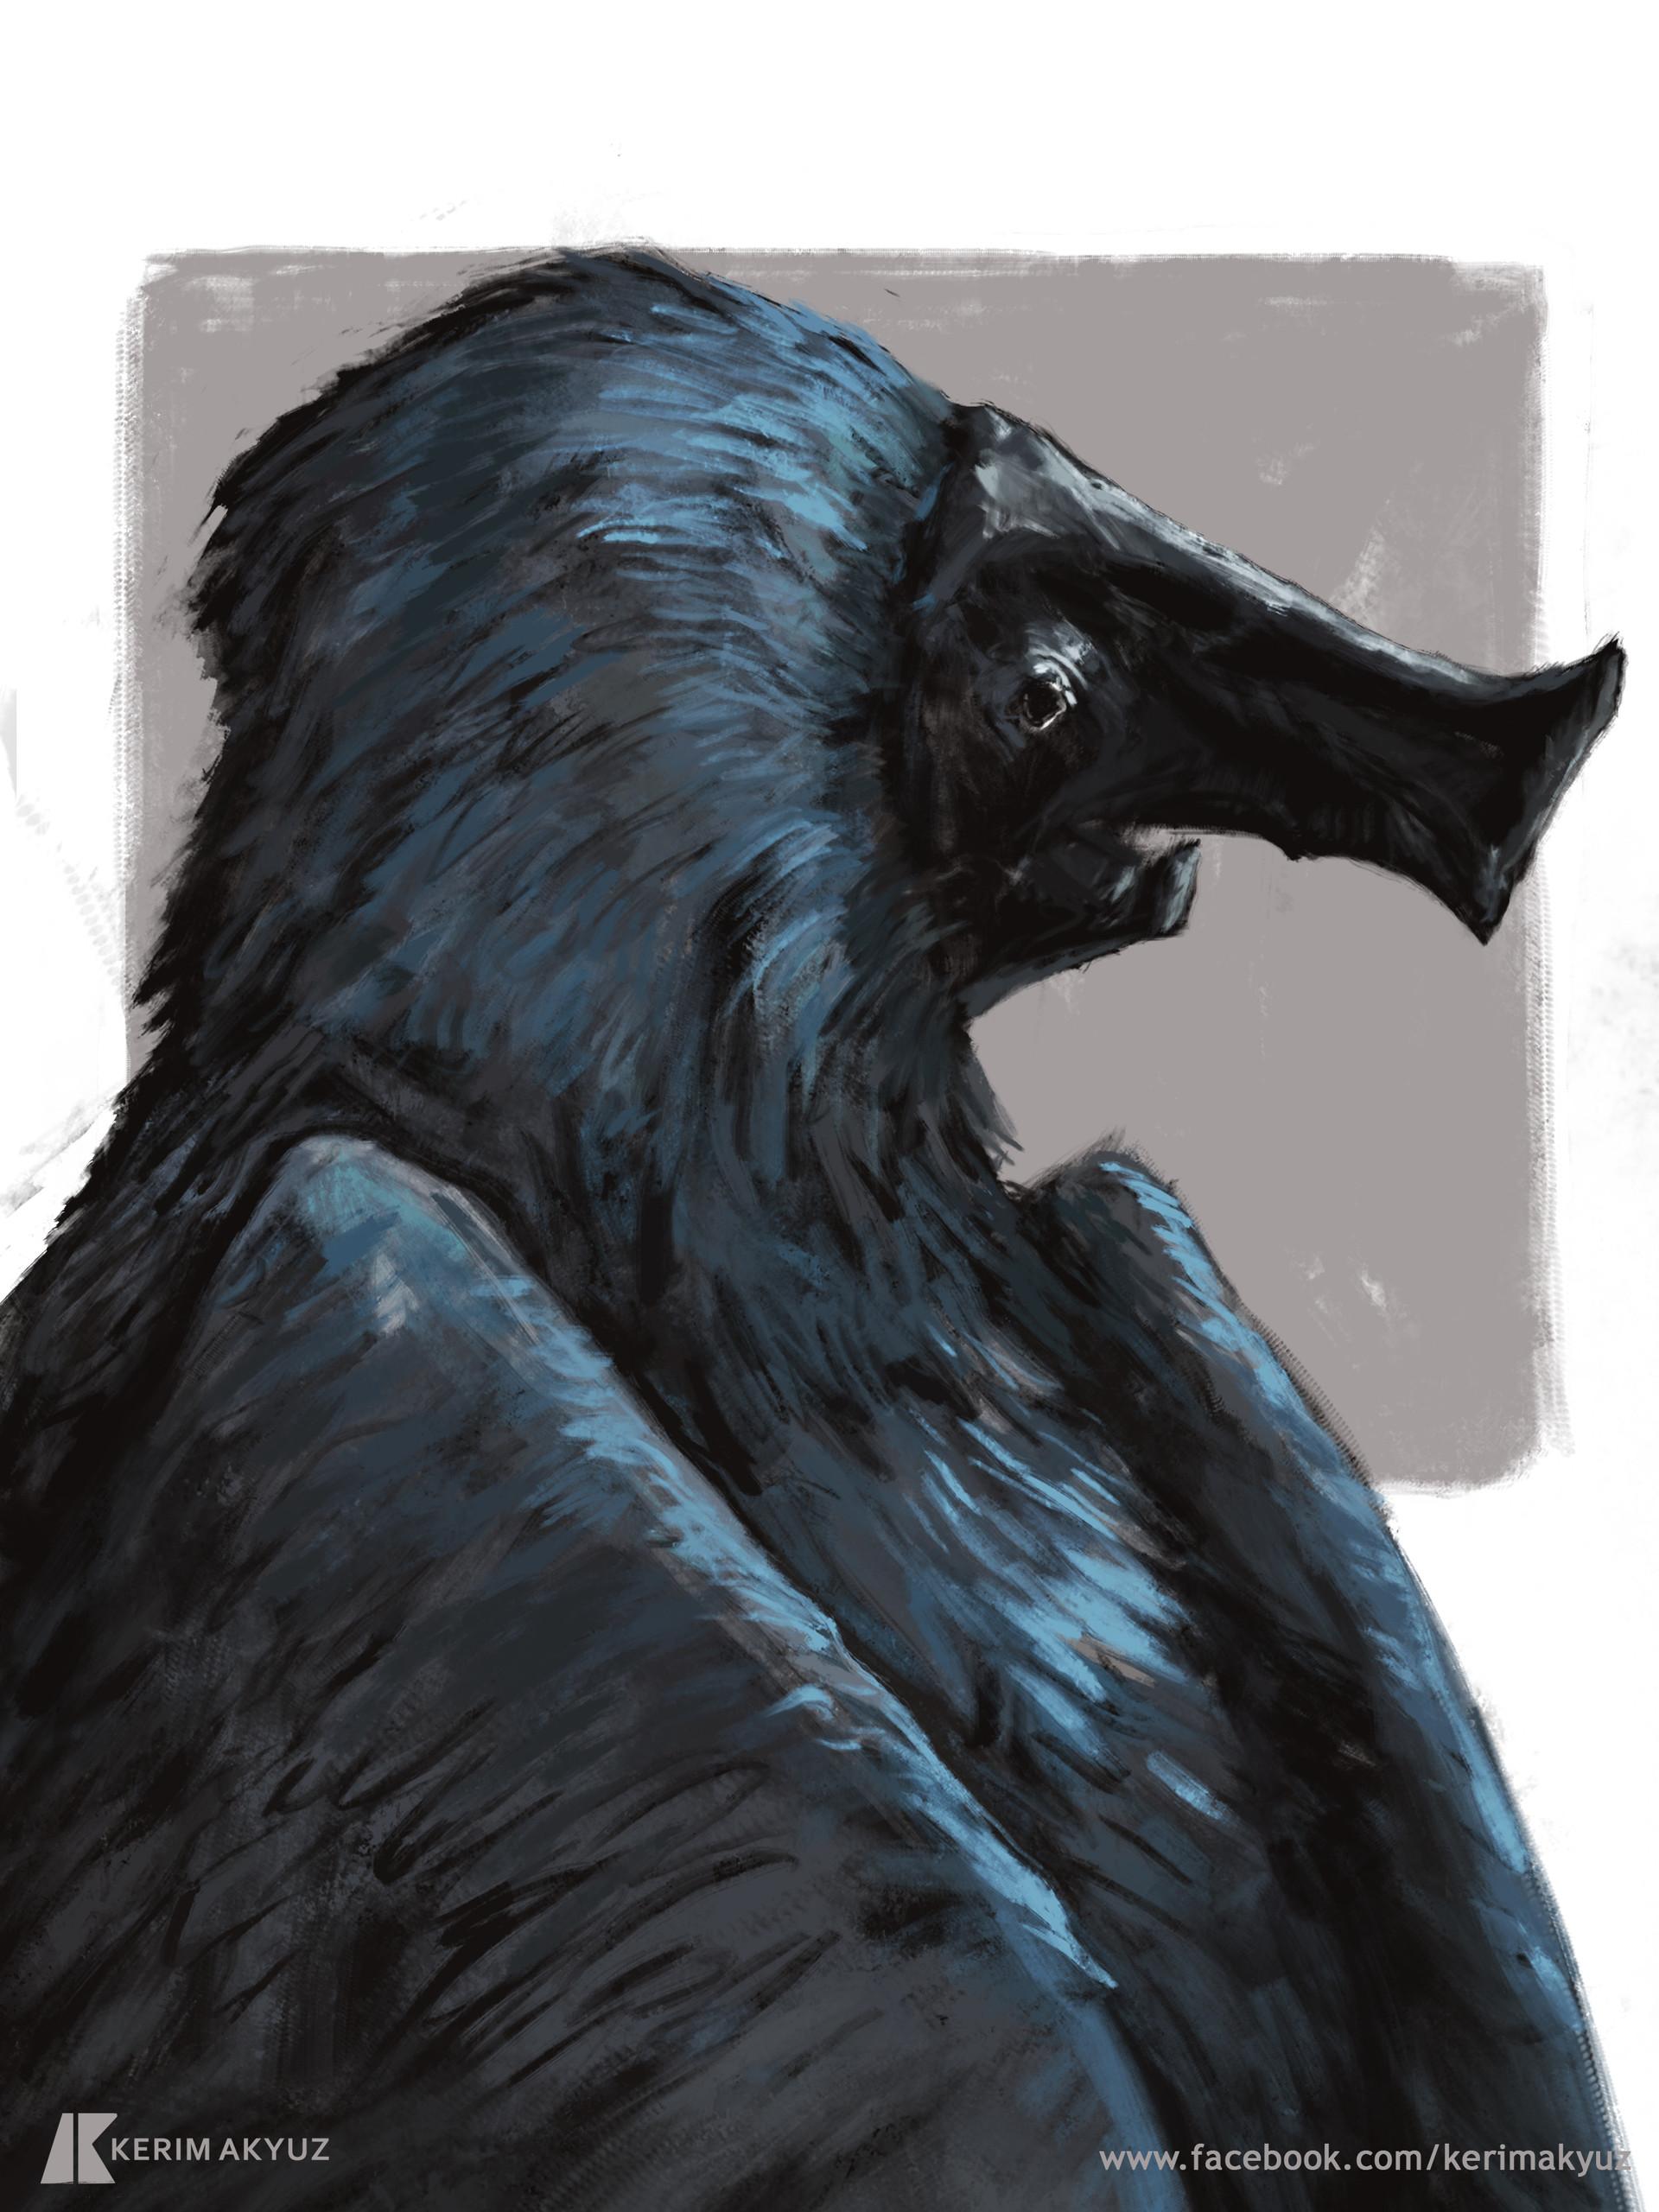 Kerim akyuz 315 bluedevilbird